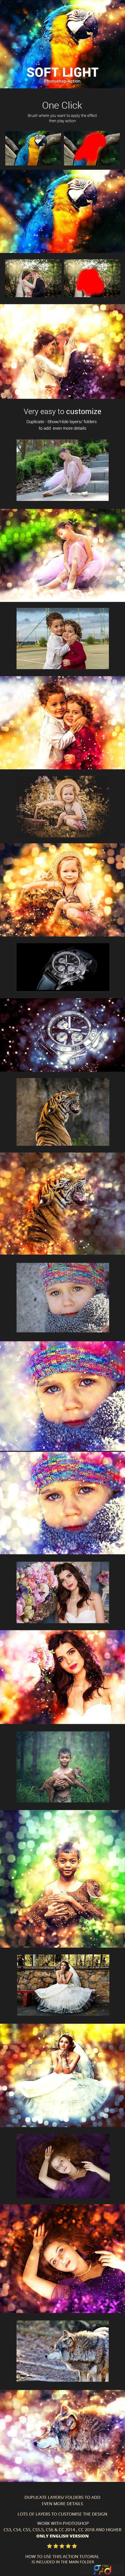 1805260 Soft Light Photoshop Action - Advanced 21731408